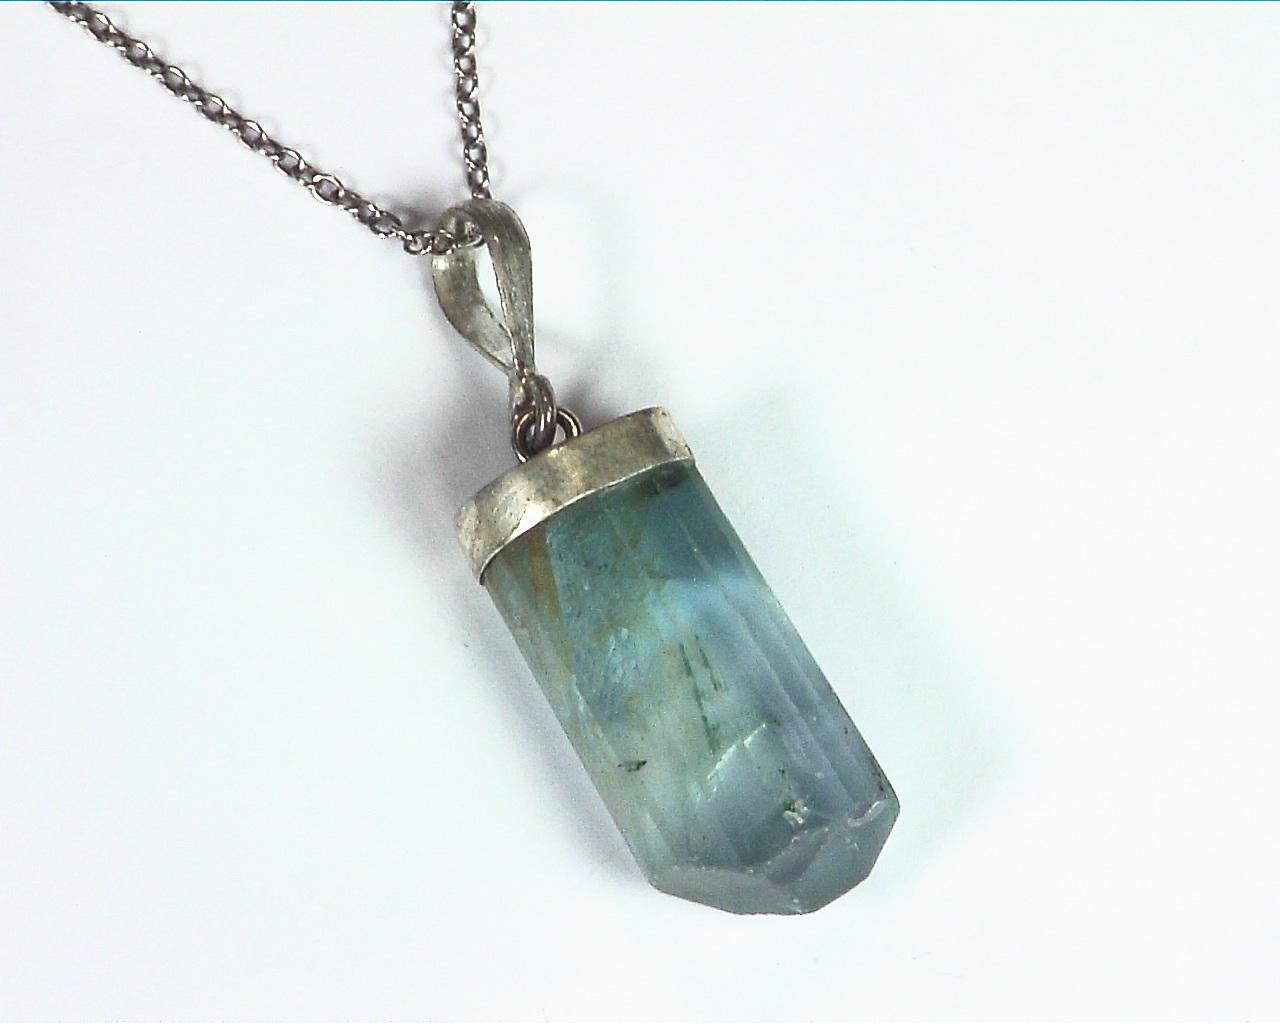 Fluorite Natural Genuine Gemstone Crystal Sterling Silver Pendent PSS,983 4